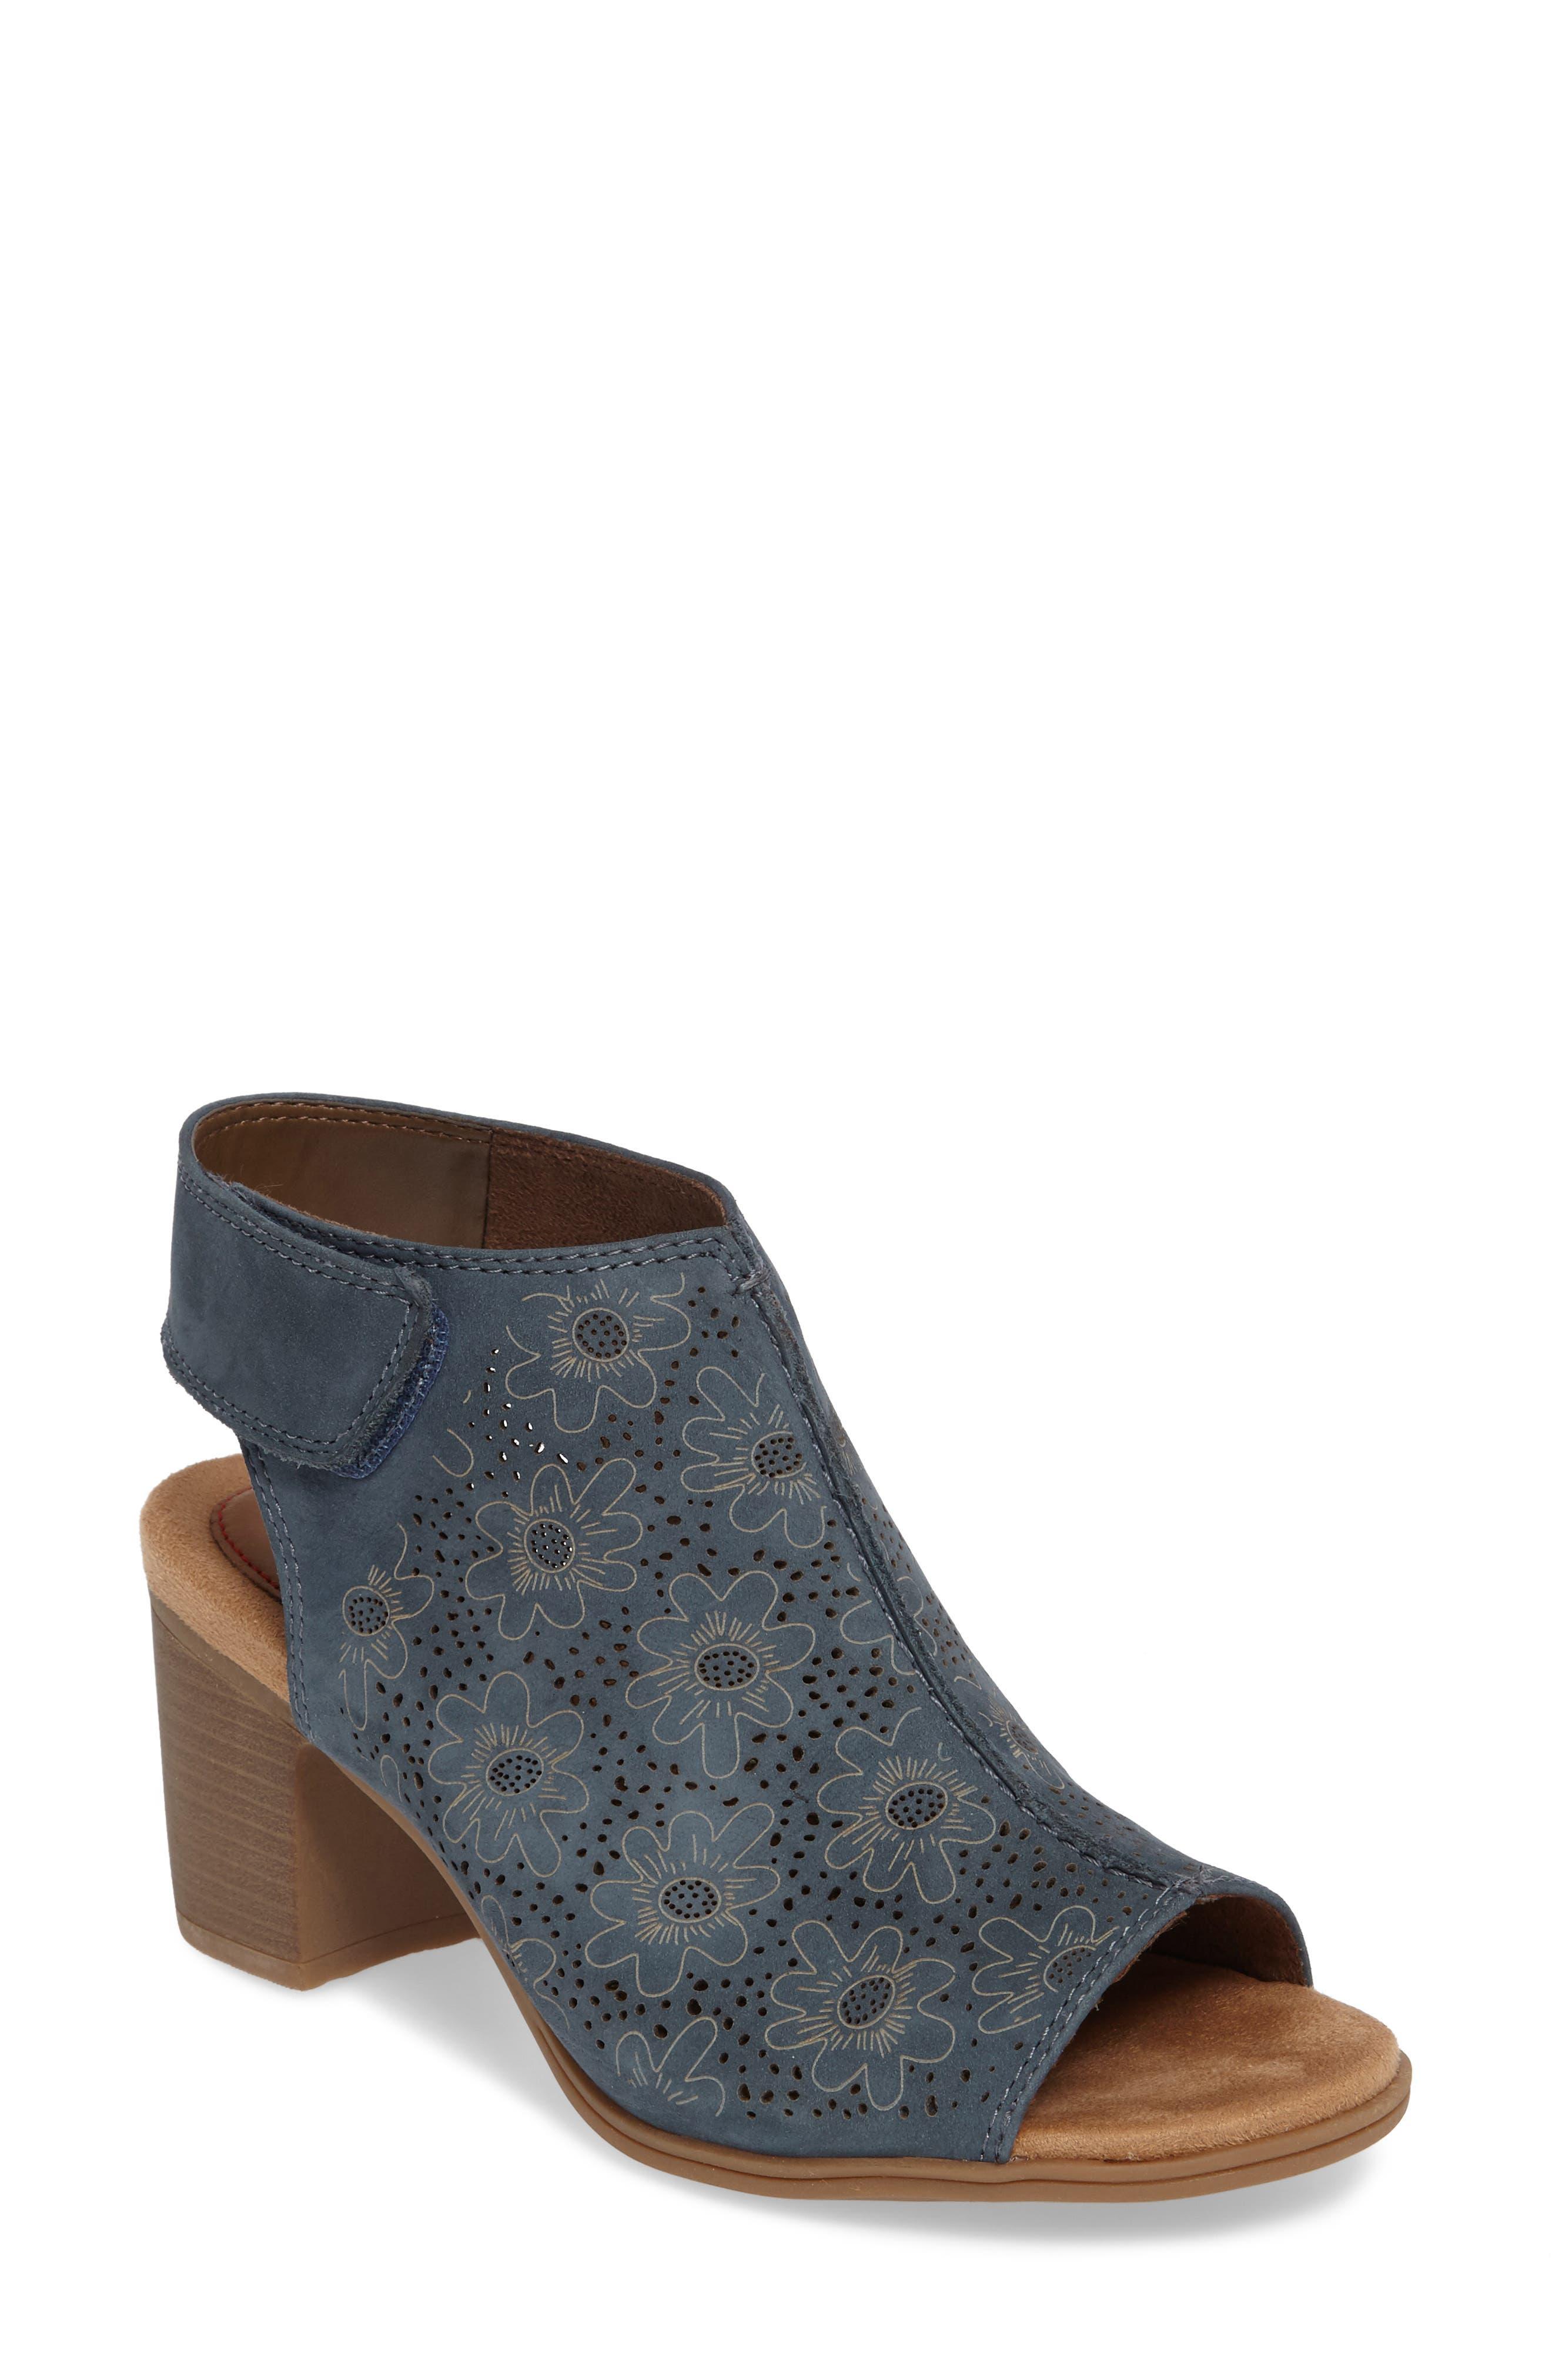 Main Image - Rockport Cobb Hill Hattie Perforated Slingback Sandal (Women)